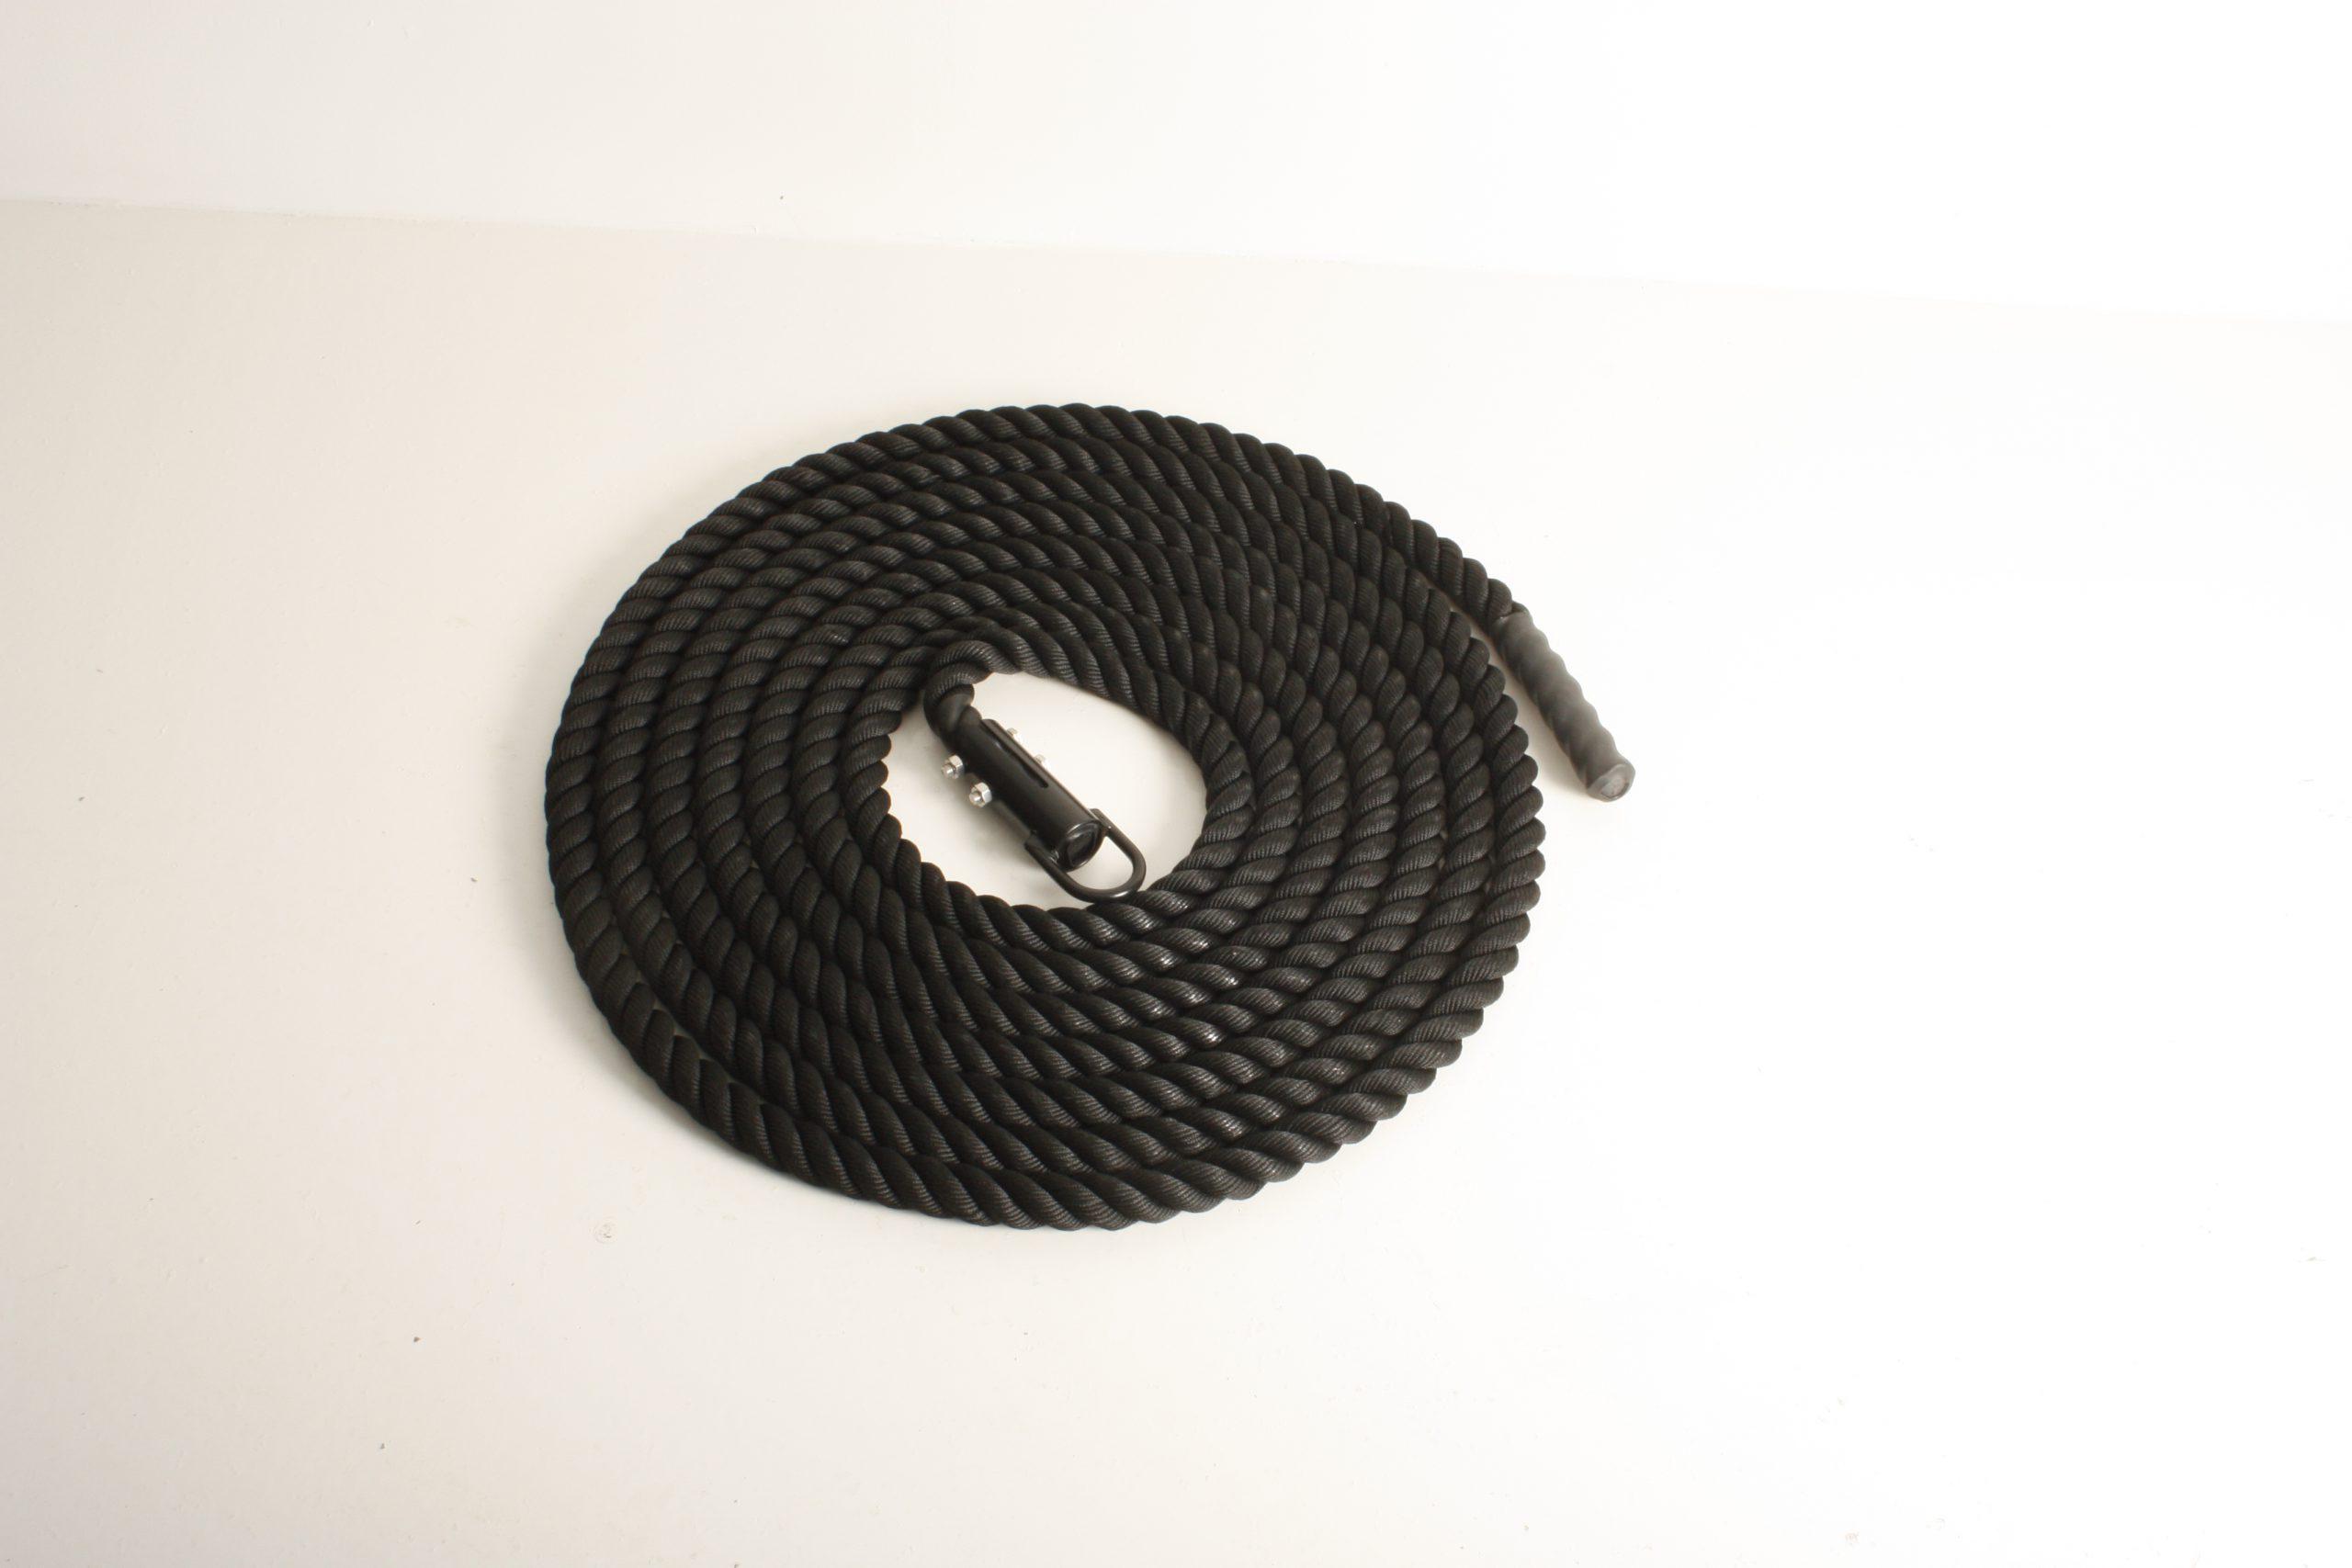 Battle rope treeniköysi 38 mm, 12 m